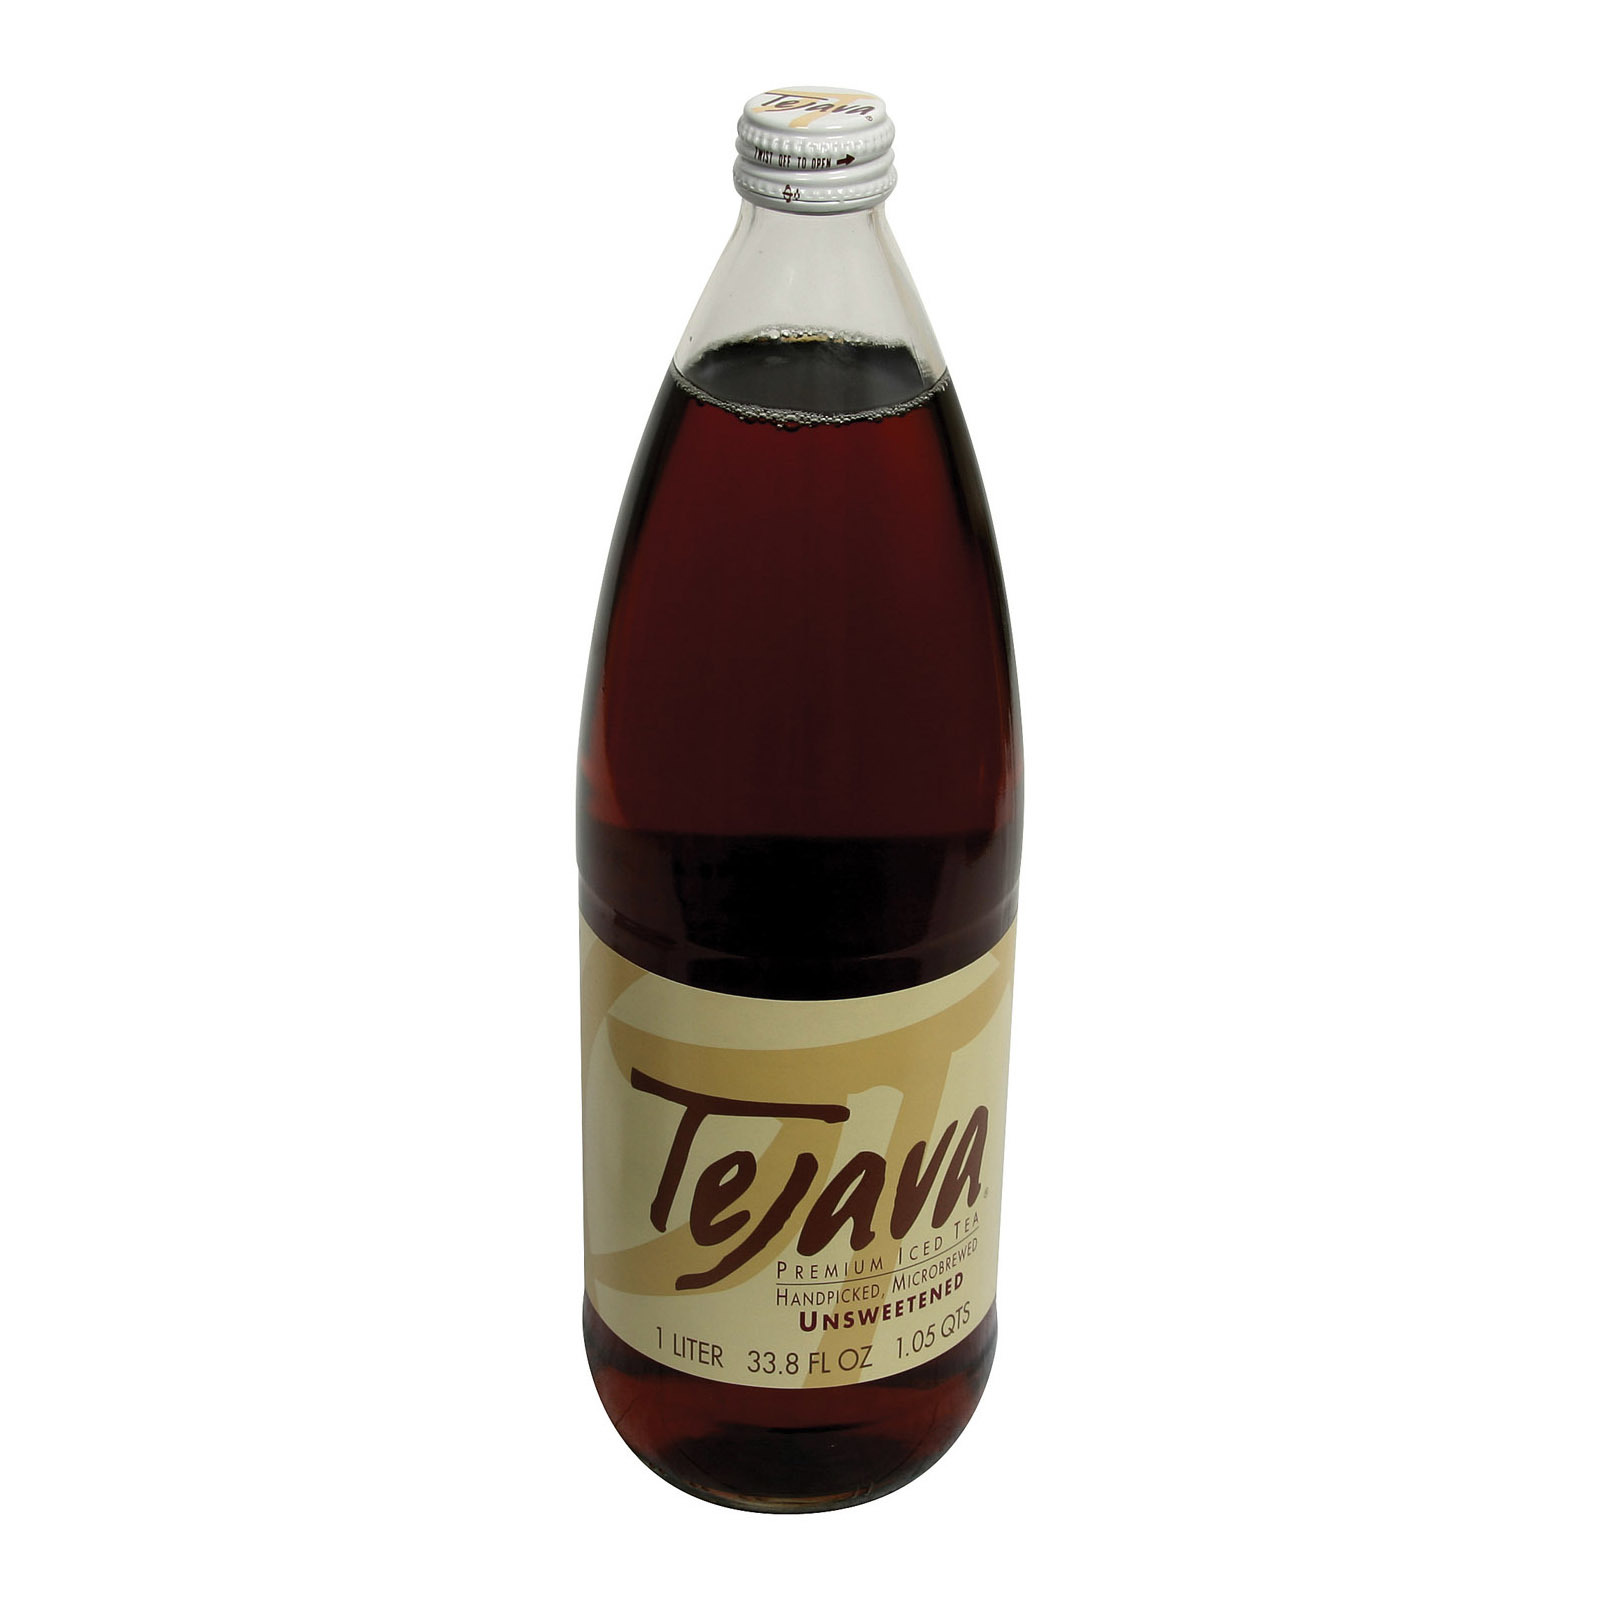 Tejava Black Tea - Unsweetened - Case of 12 - 1 Liter